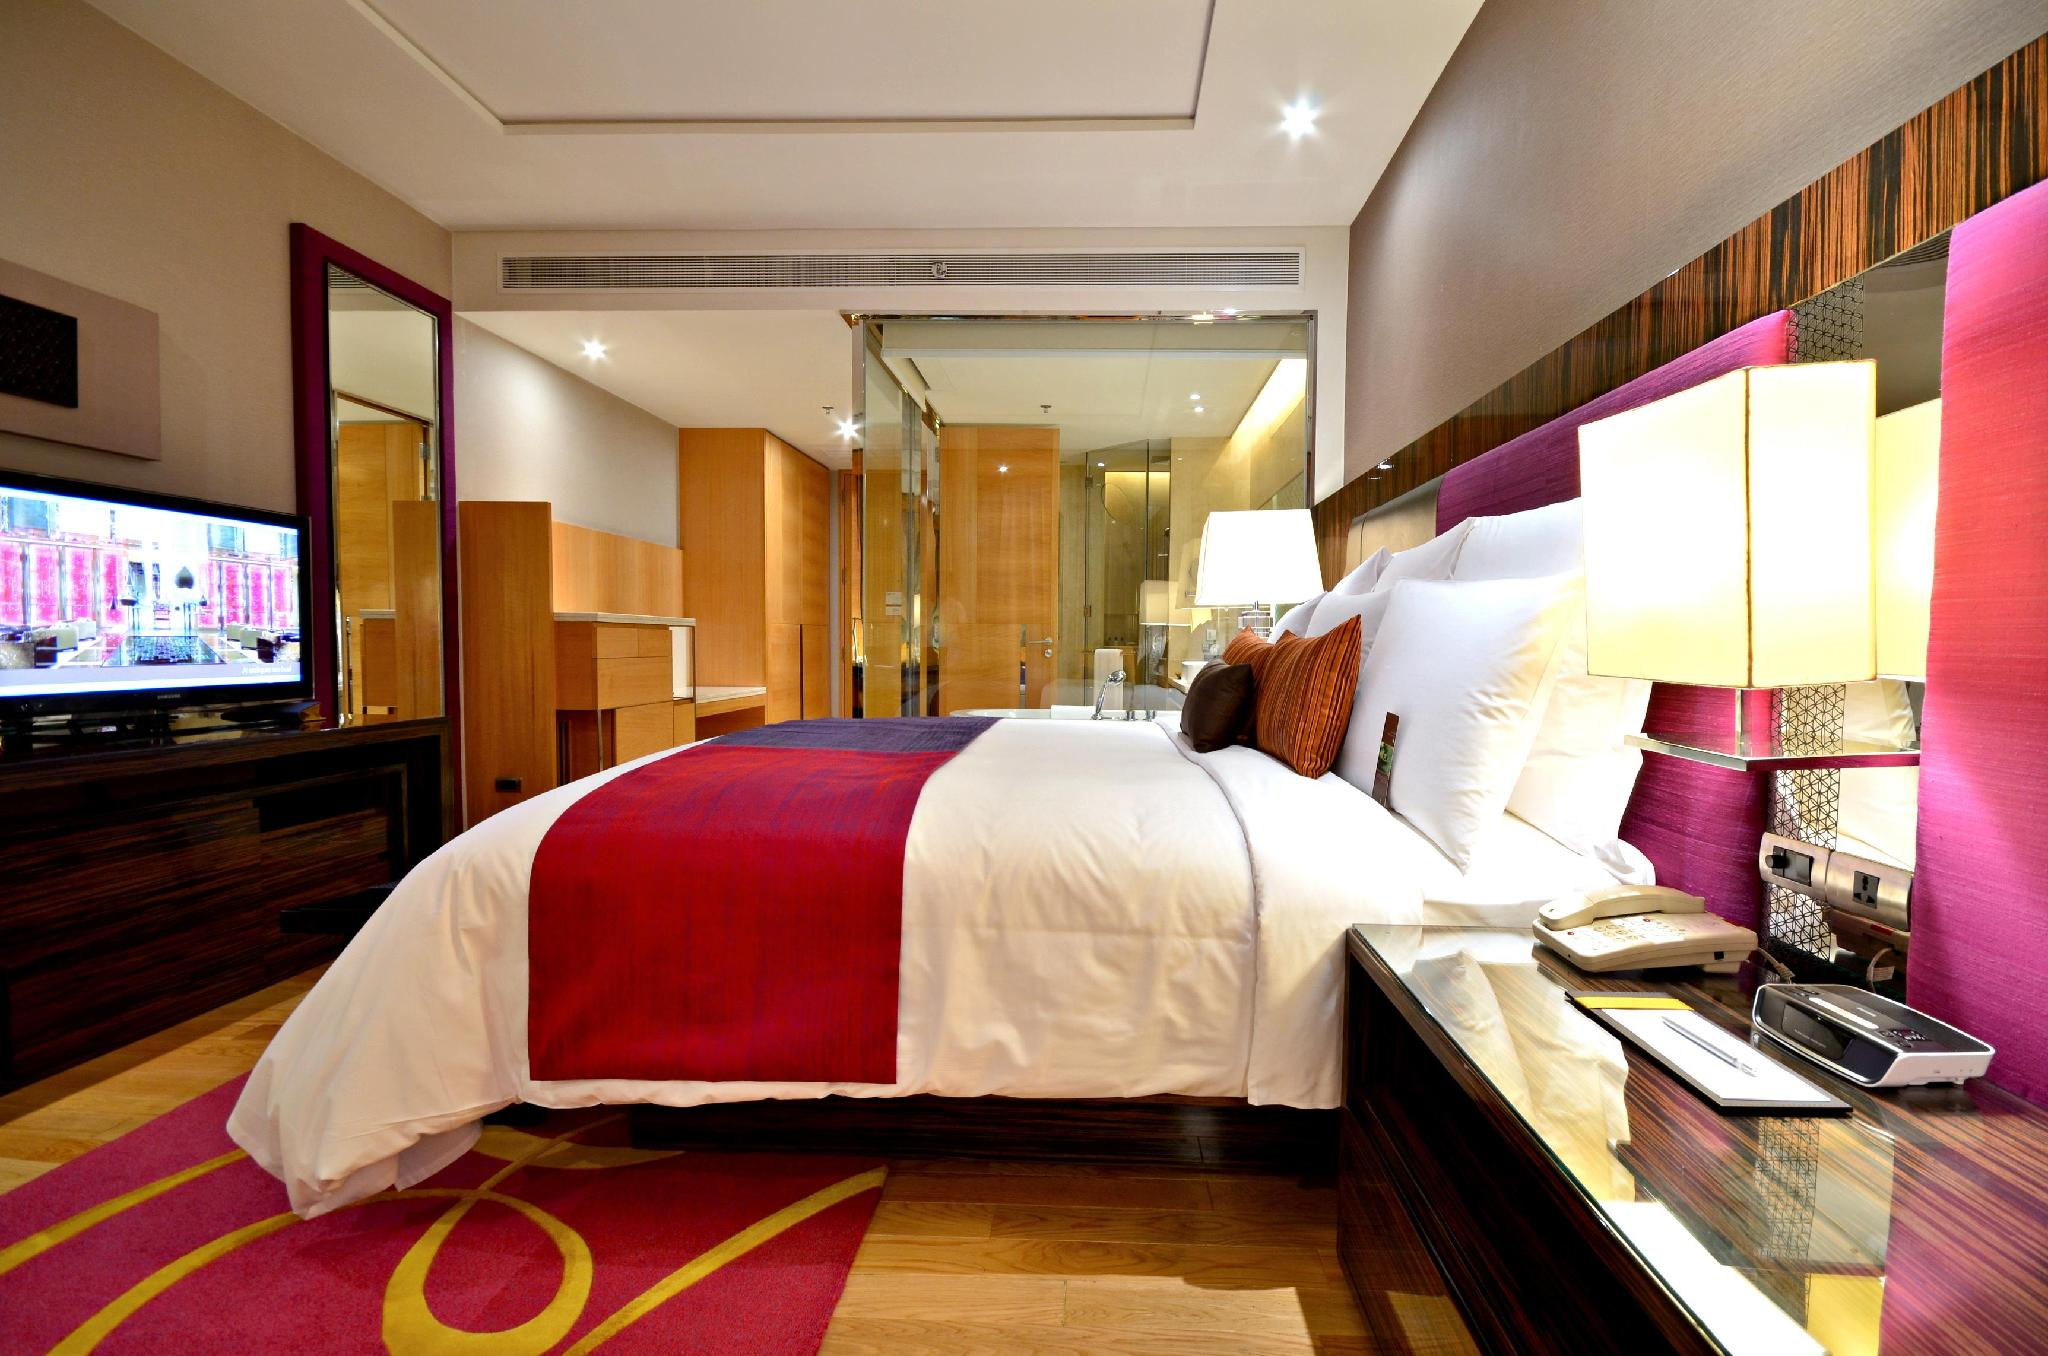 هتل رنسانس بانکوک راچاپراسونگ بانکوک